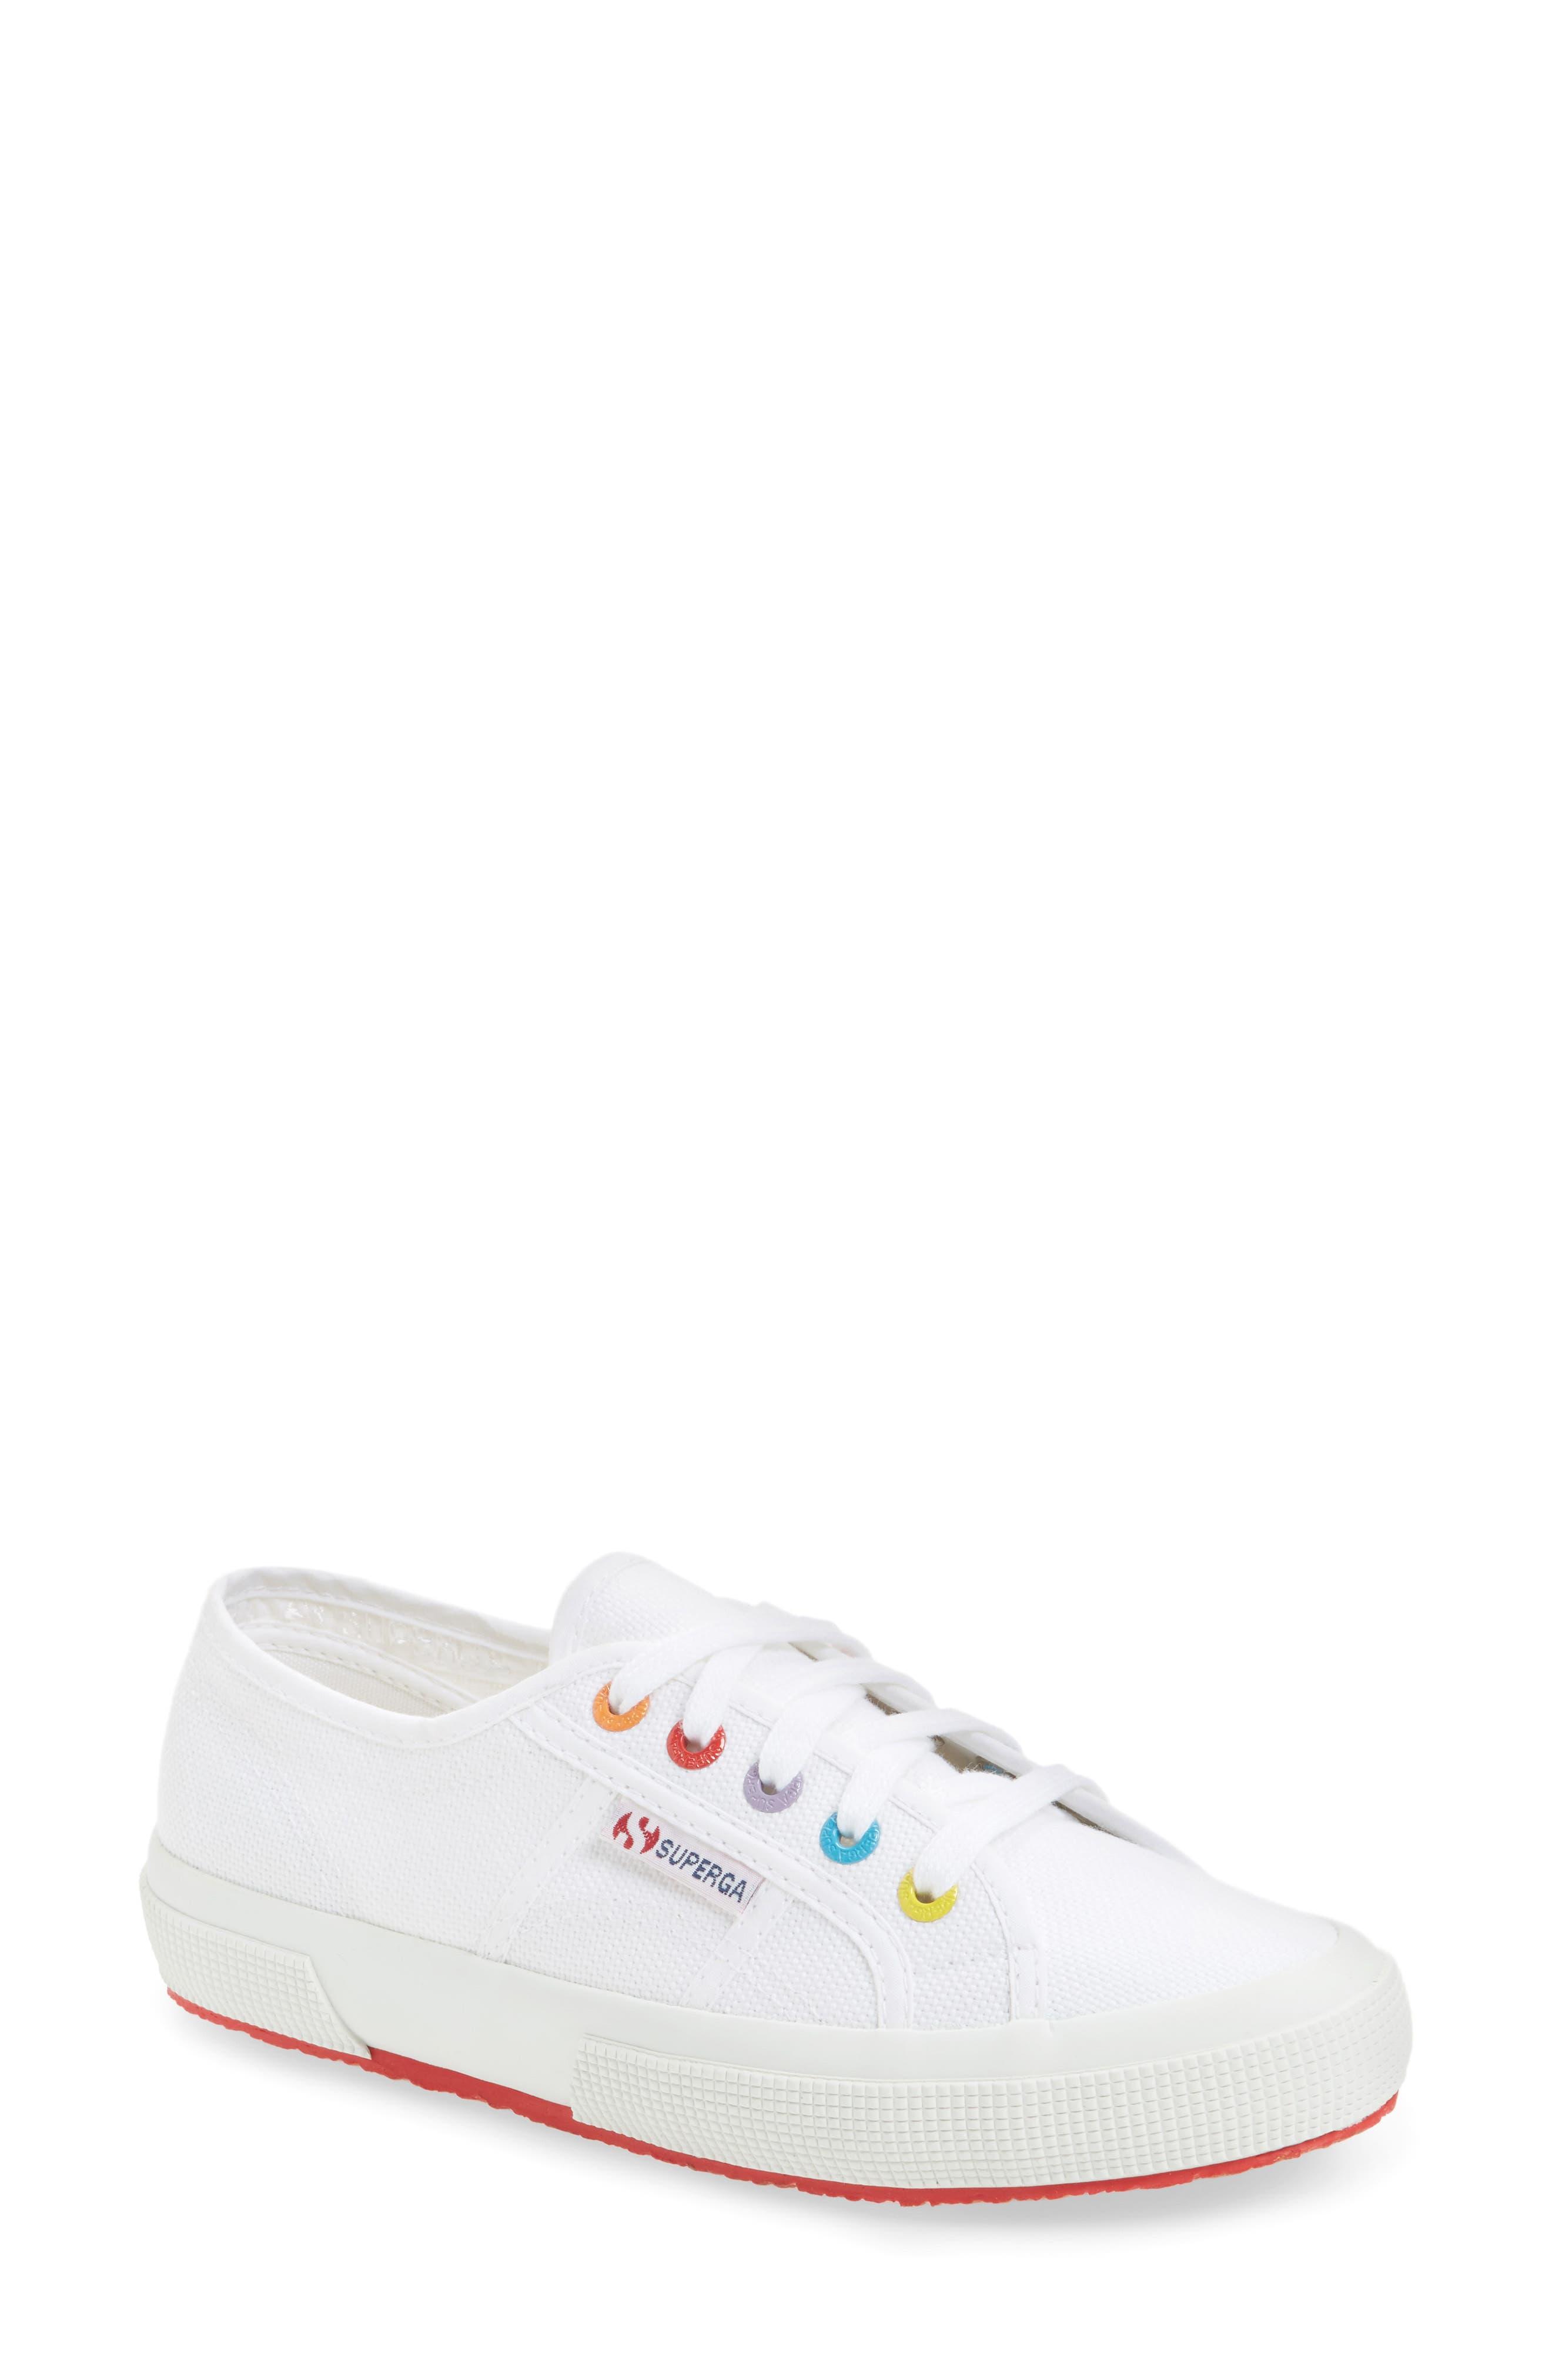 2750 Rainbow Sneaker,                             Main thumbnail 2, color,